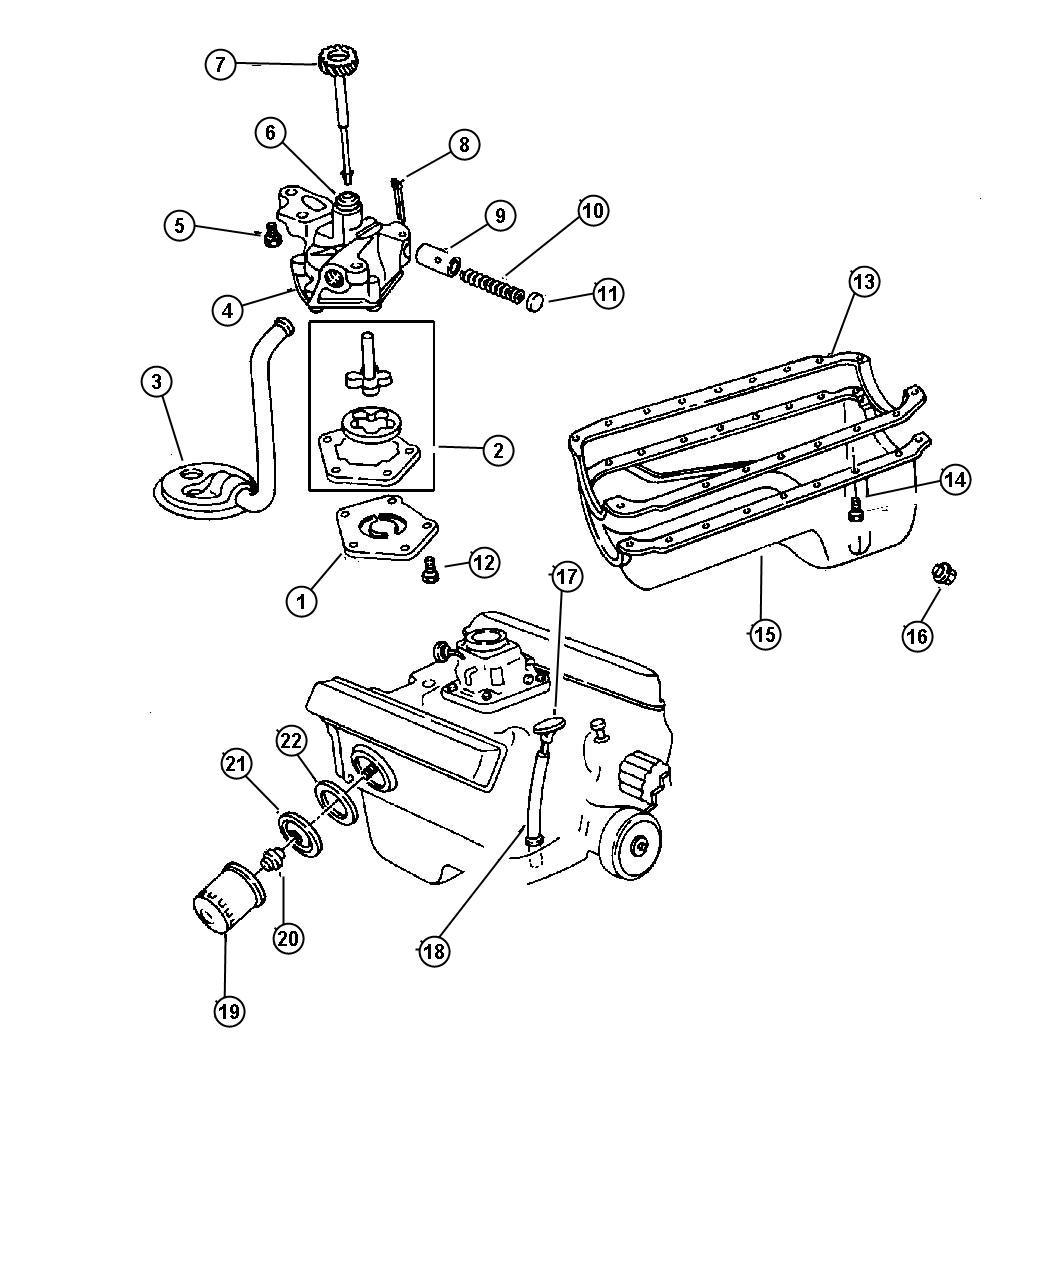 1998 Dodge Dakota Plate. Oil filter adapter. Engine